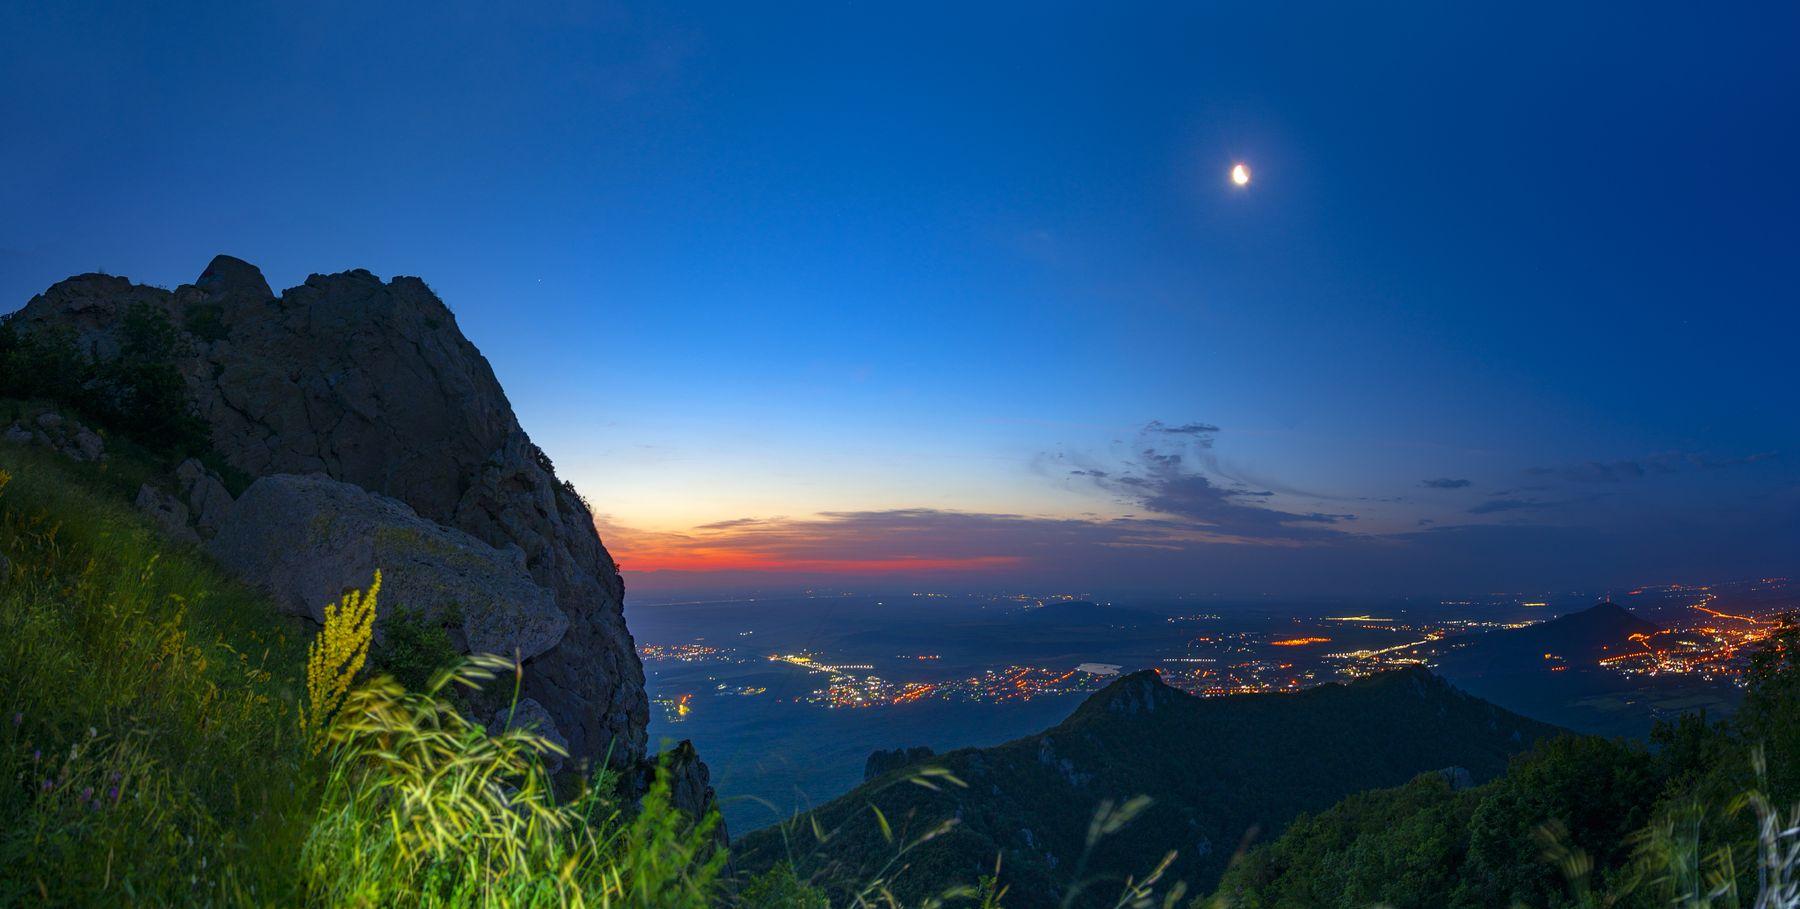 Предрассветная ночь пятигорск бештау машук луна панорама пейзаж